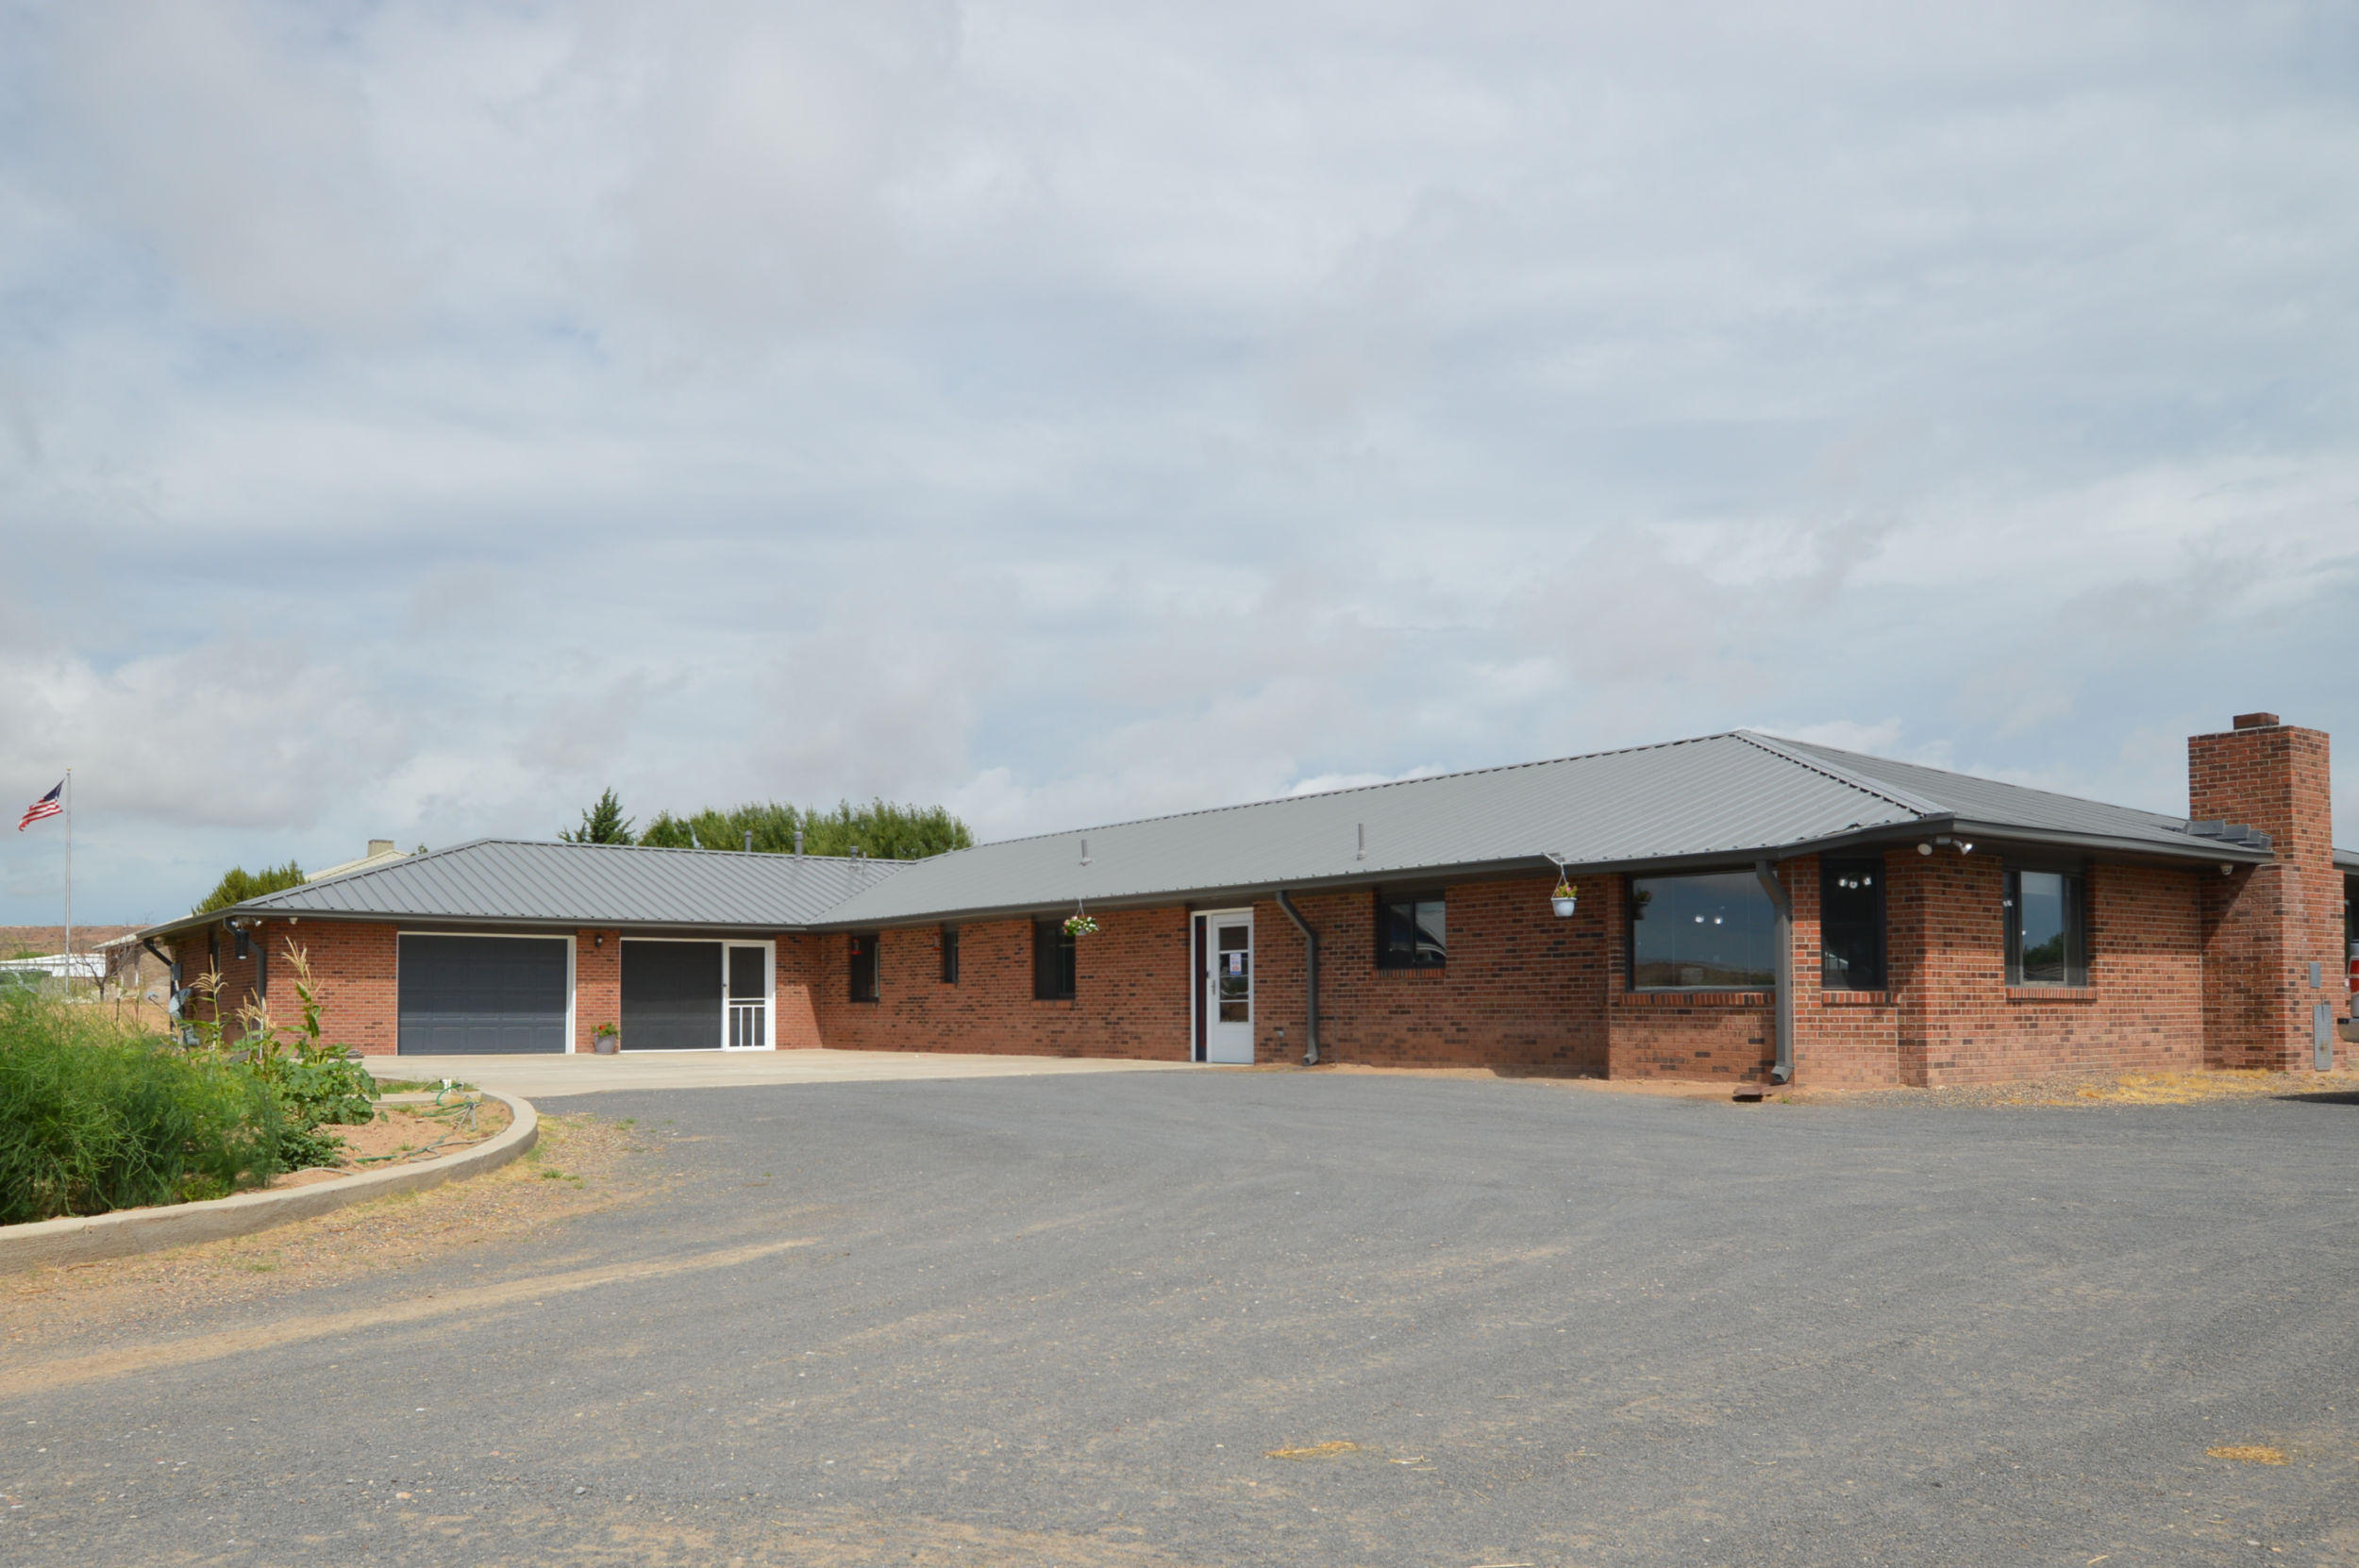 3 Waggoner Lane, Belen, NM 87002 - Belen, NM real estate listing